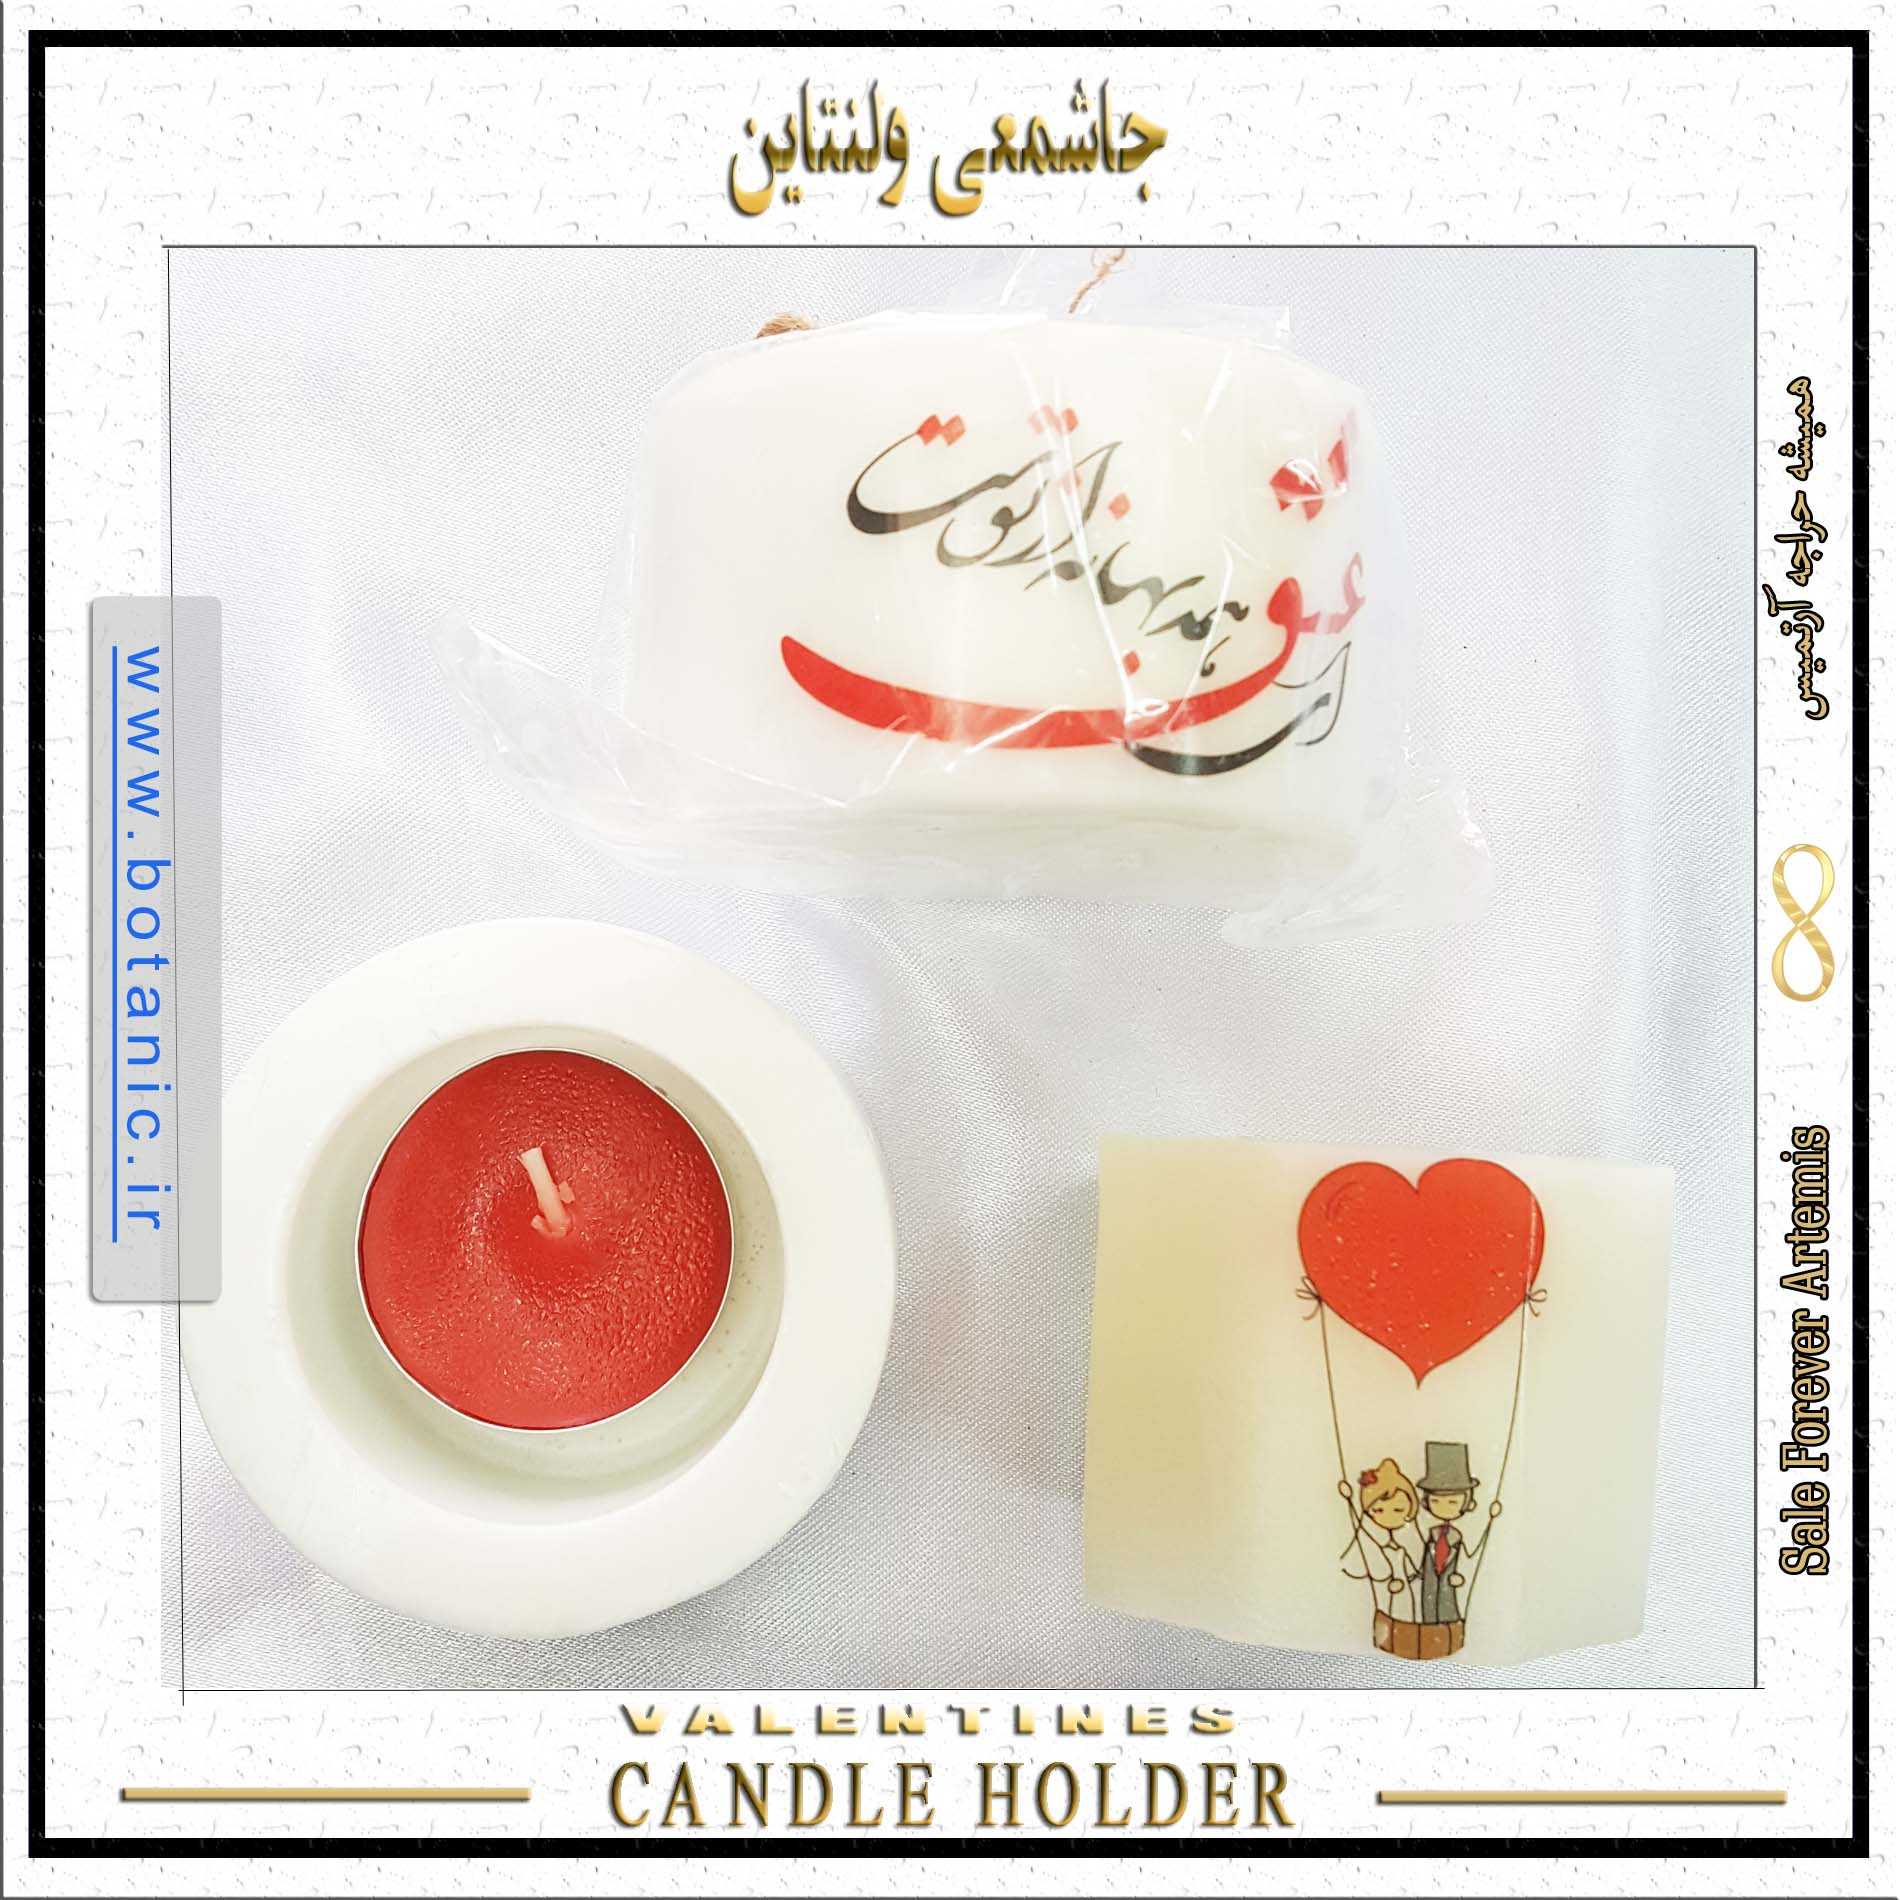 Valentines Candle Holder